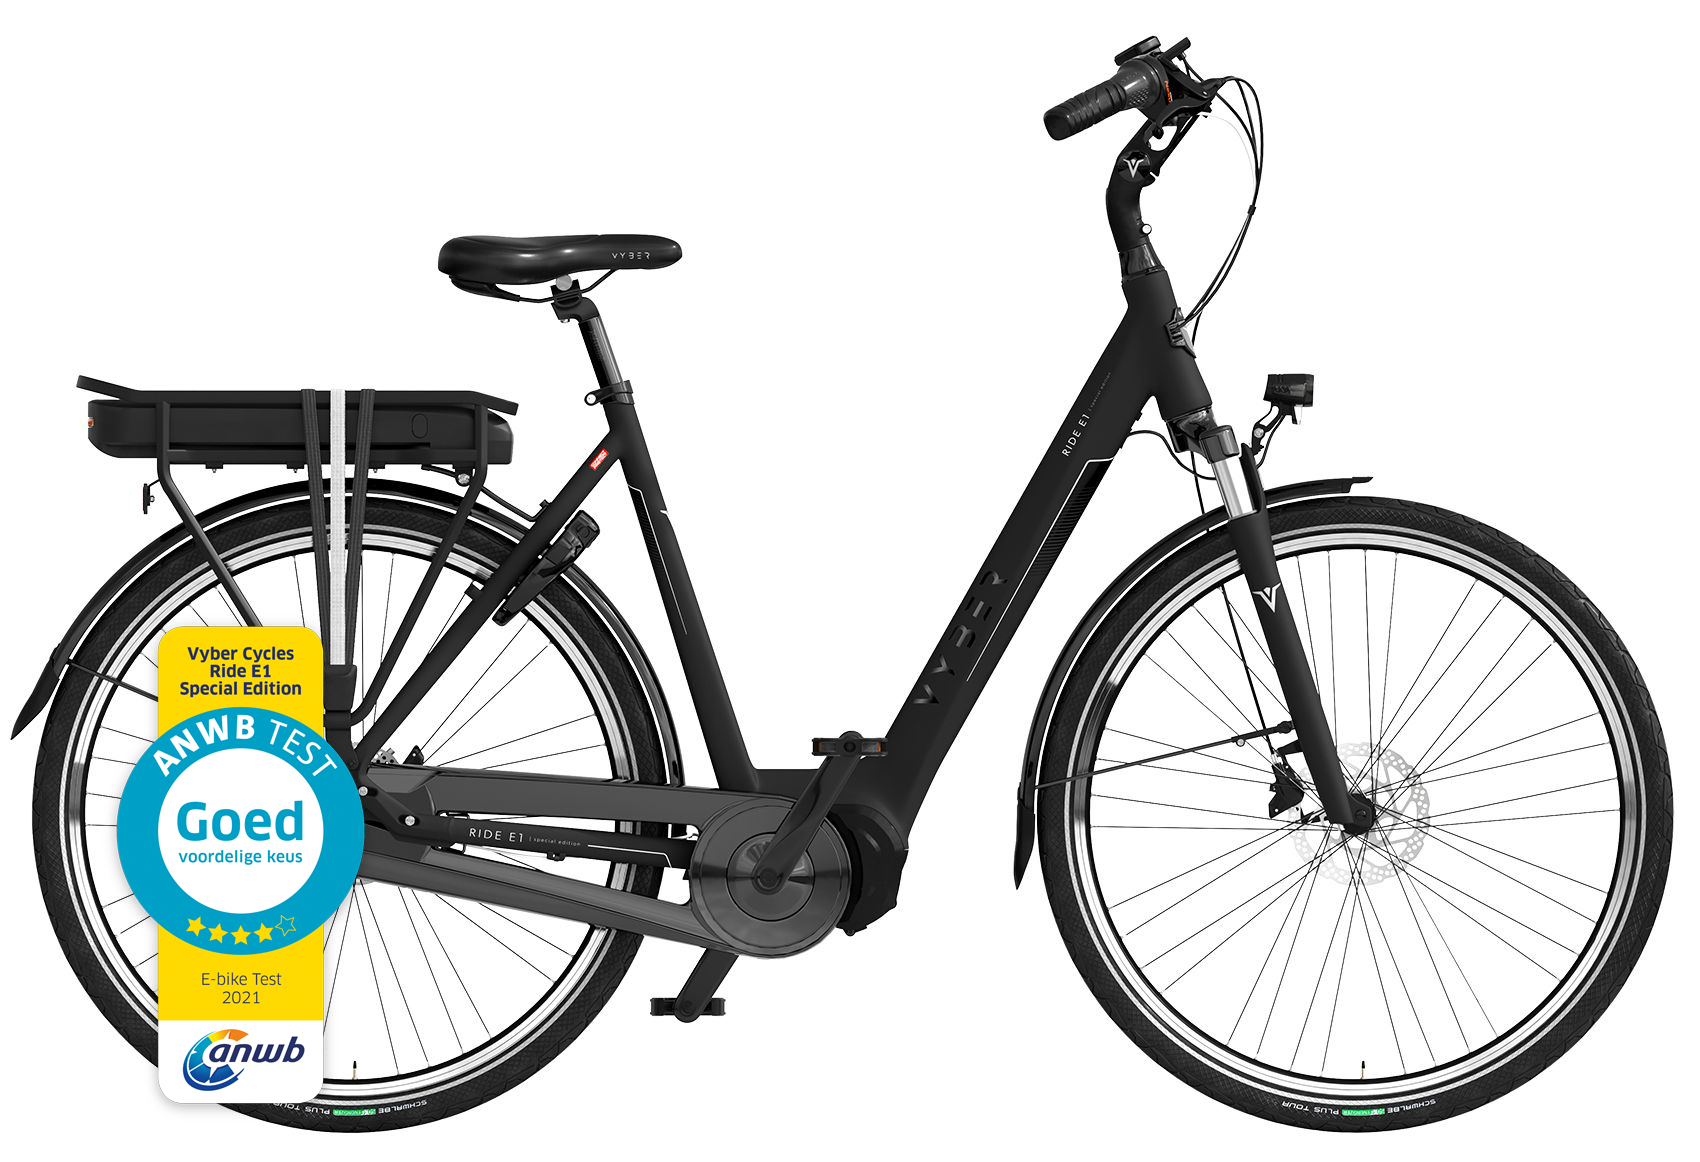 Vyber Ride E1 Special Edition elektrische fiets